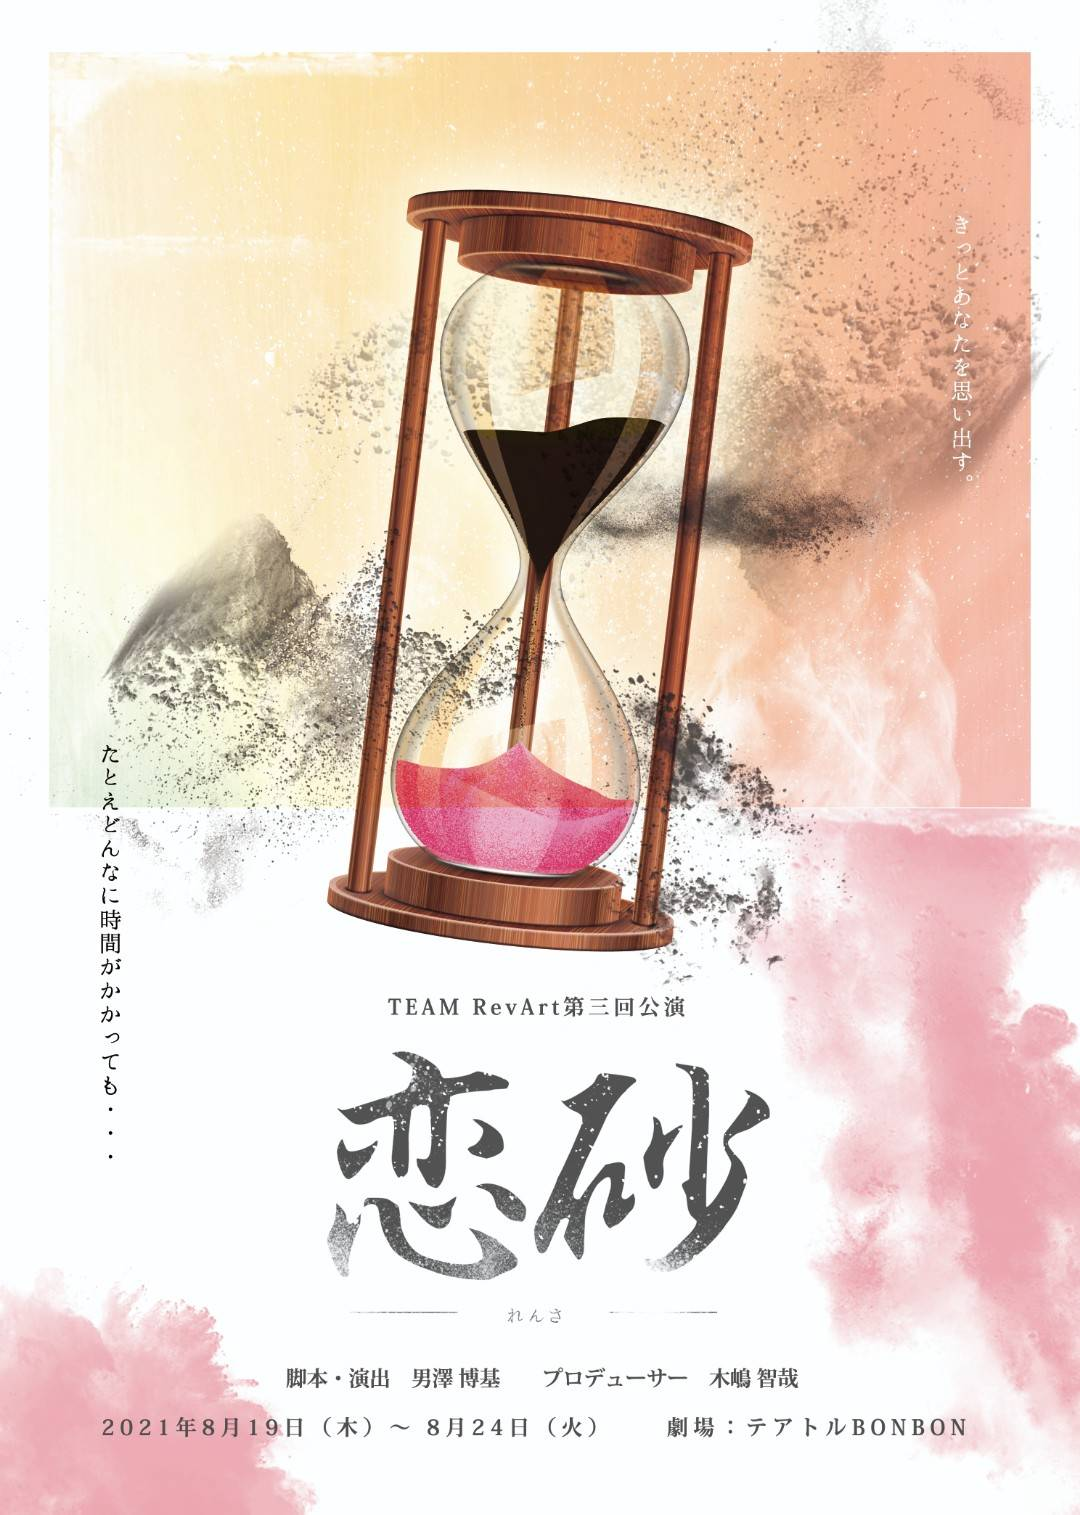 TEAM RevArt 第三回公演 恋砂 ーれんさー 「時」8/24 12:00~